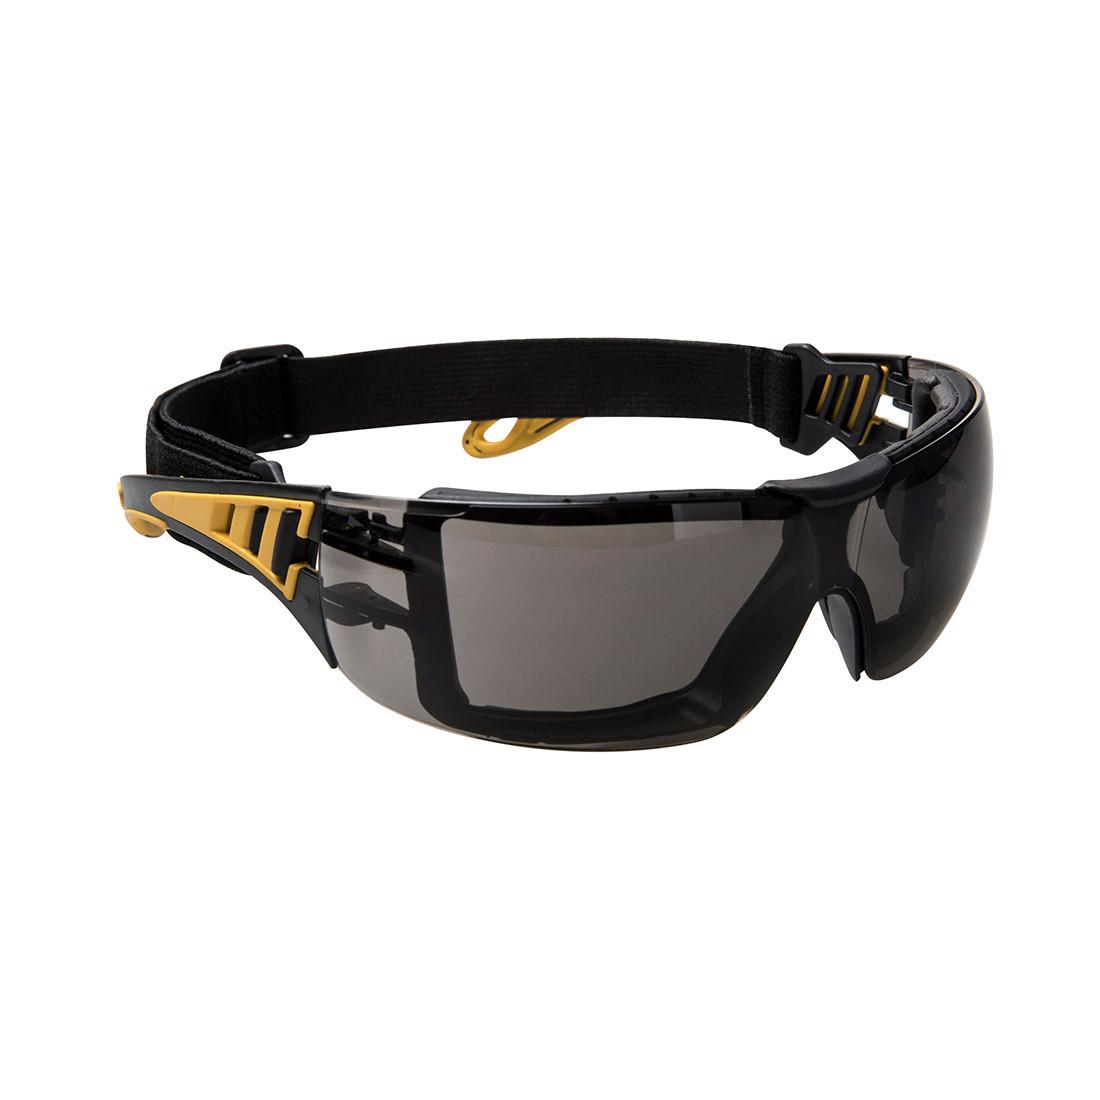 Ochelari Impervious Tech - Impermeabili - Echipamente de protectie personala